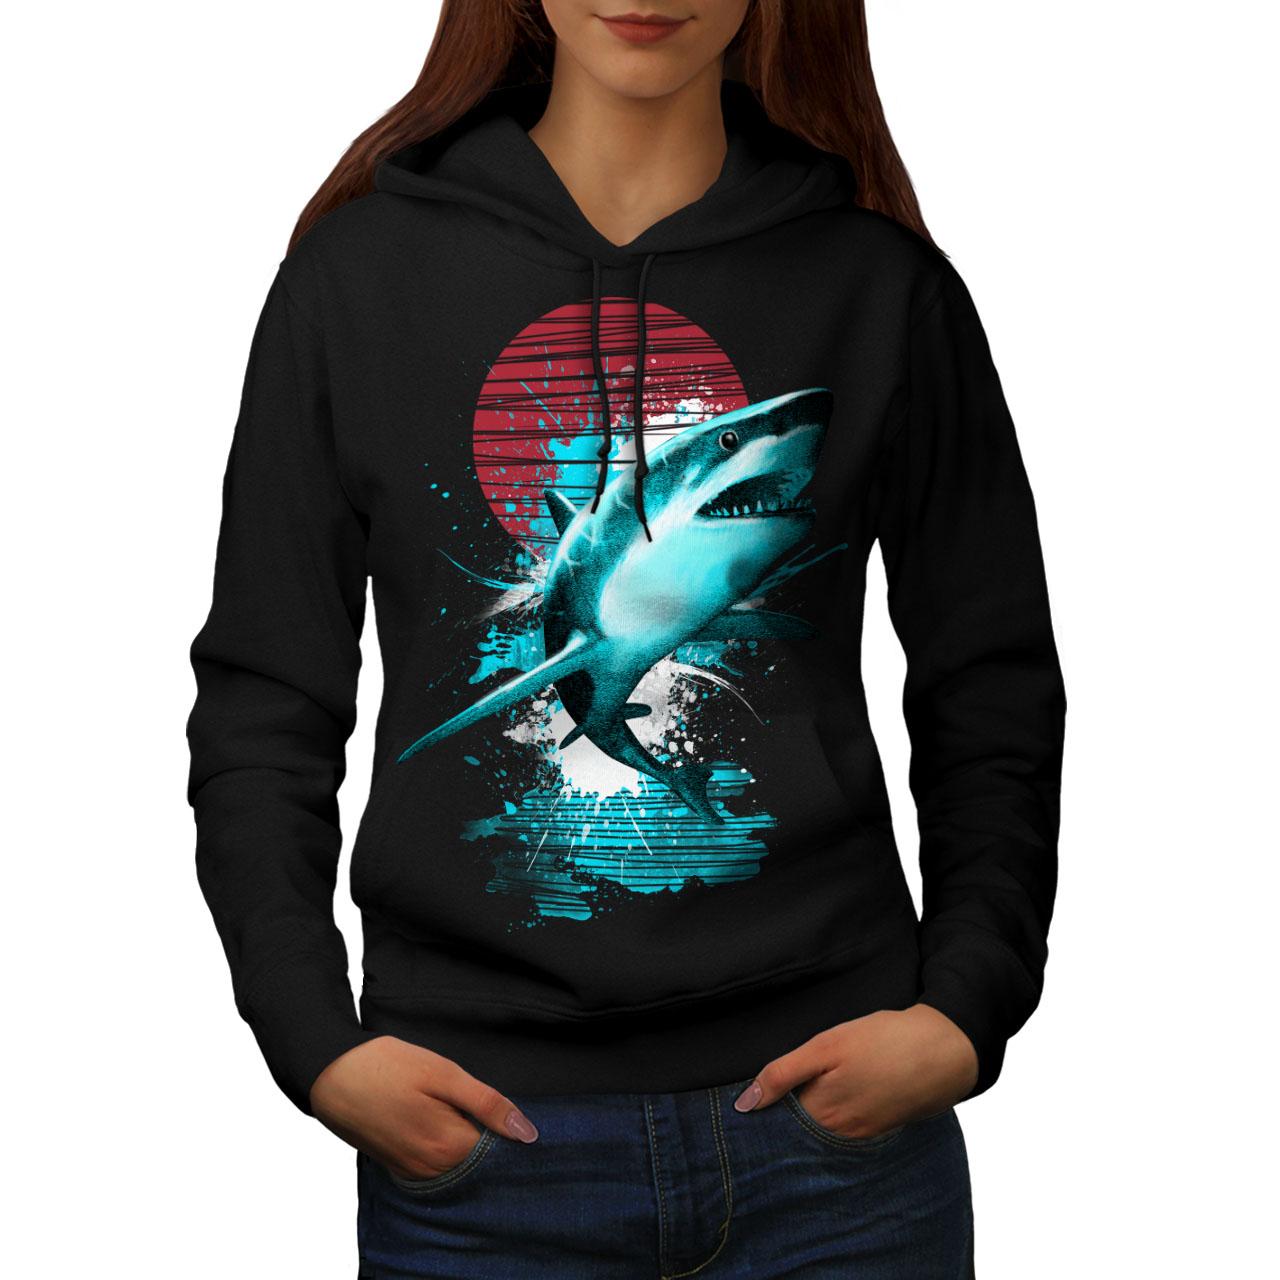 Ocean Hunt Casual Pullover Jumper Wellcoda Great White Shark Mens Sweatshirt